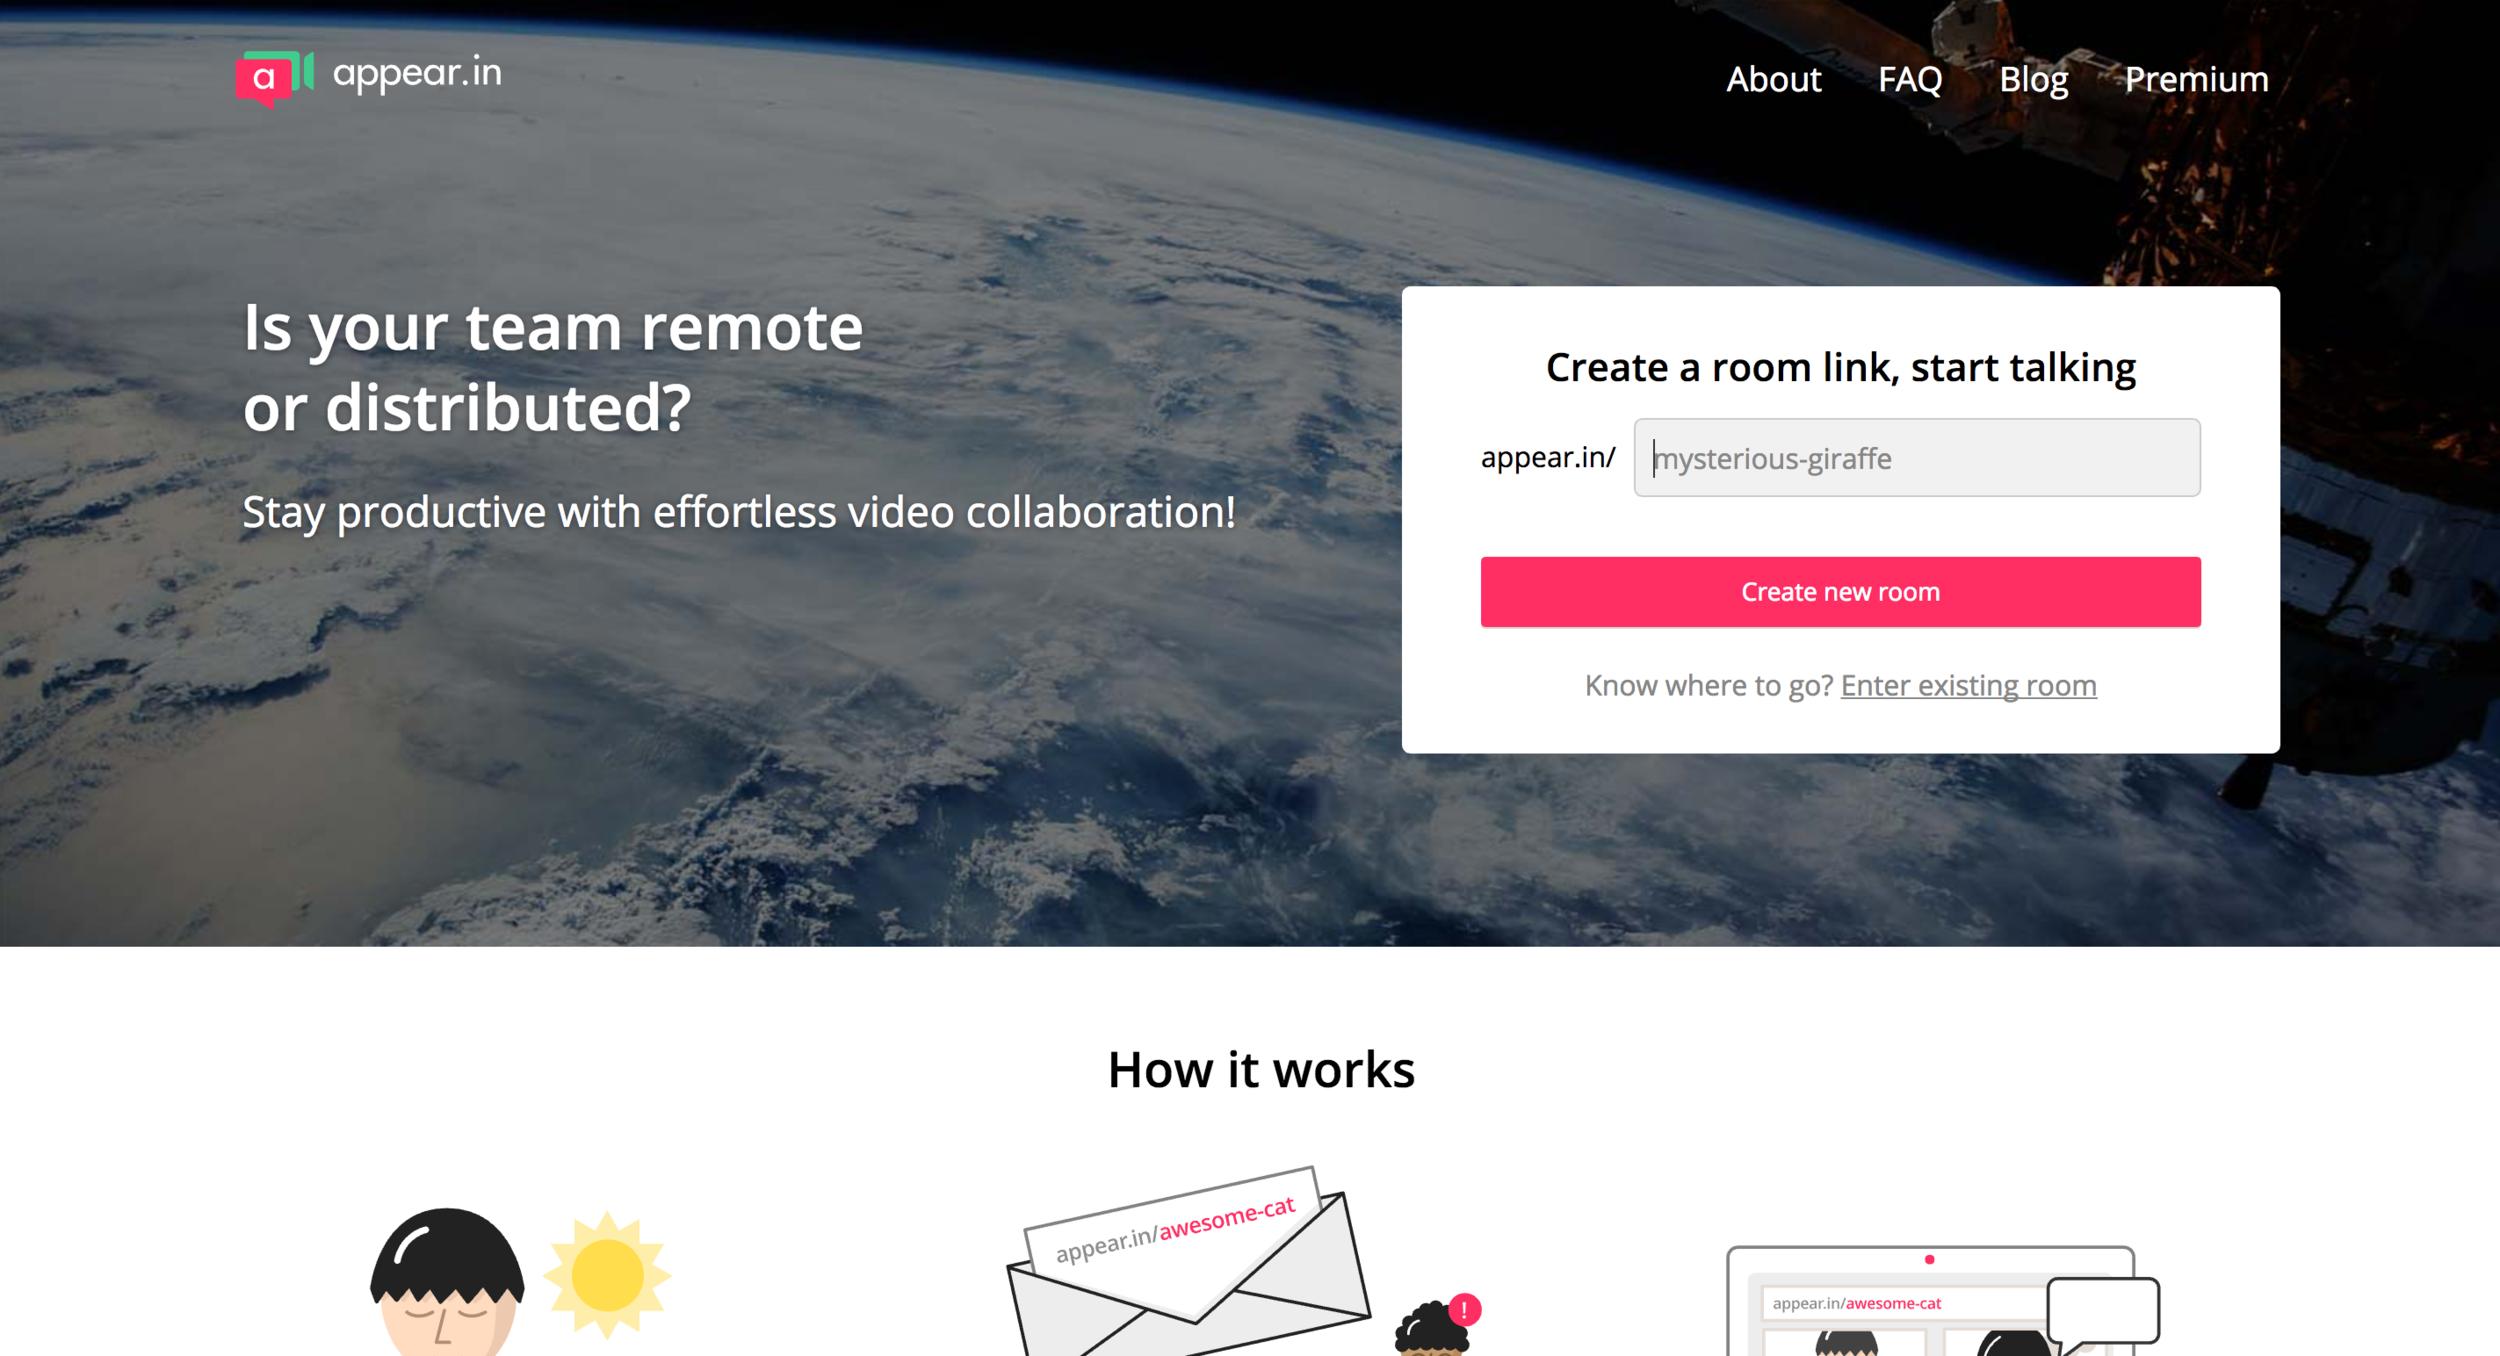 jacob-ruiz-design-blog-tools-appear-in